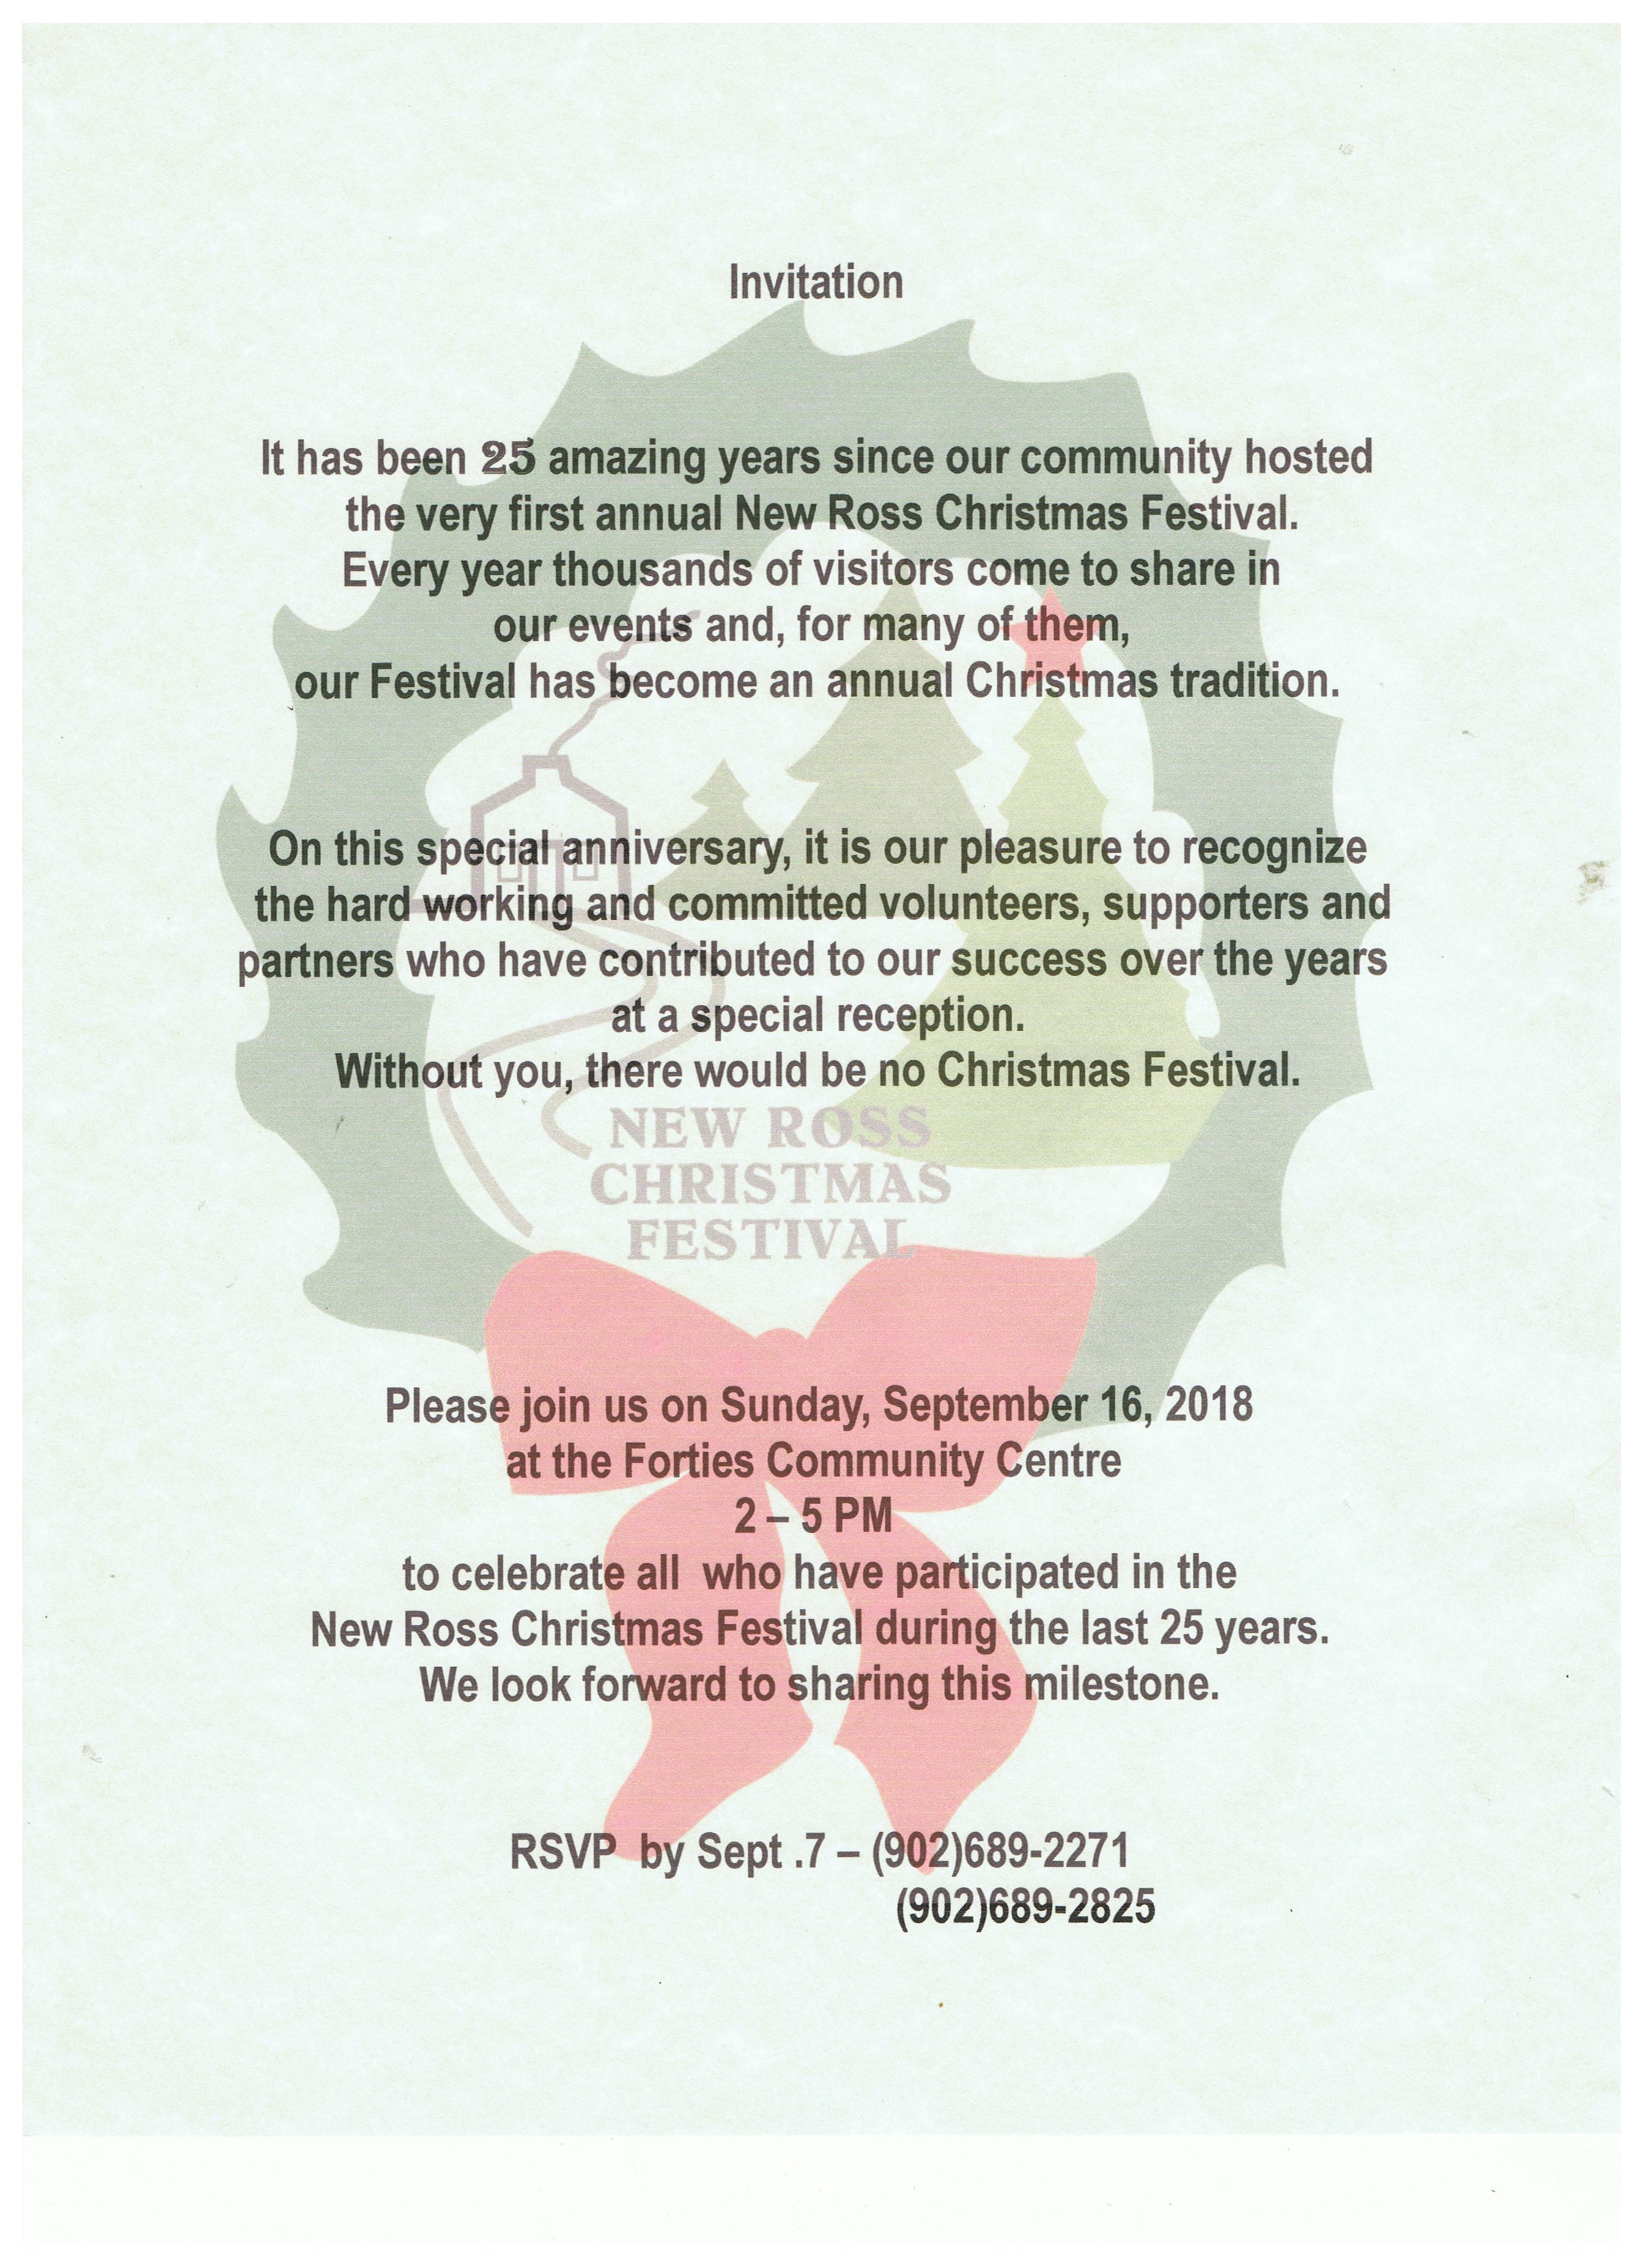 Christmas Festival | The Community of New Ross